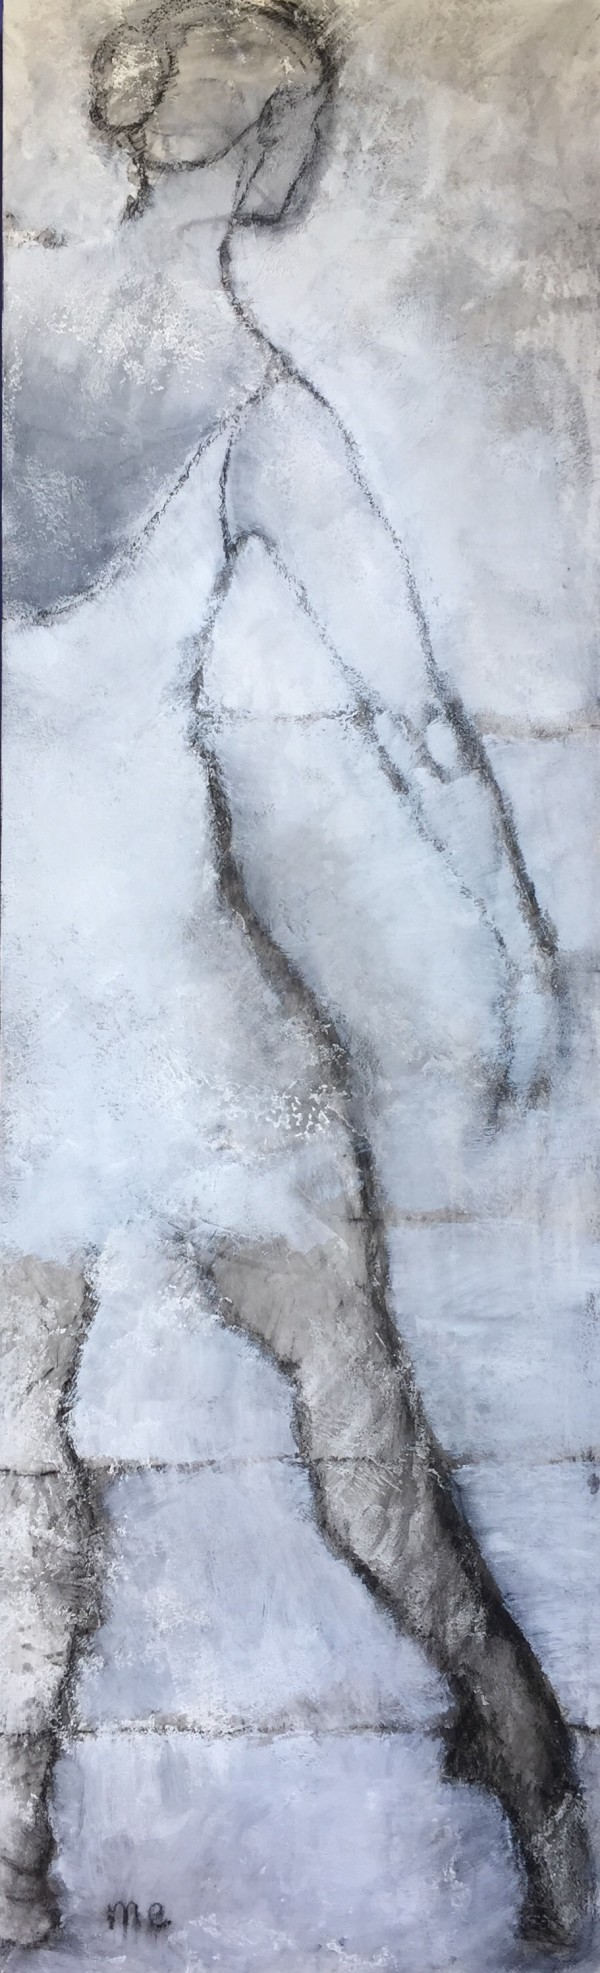 Beginning to Unfold by Marianne Enhörning